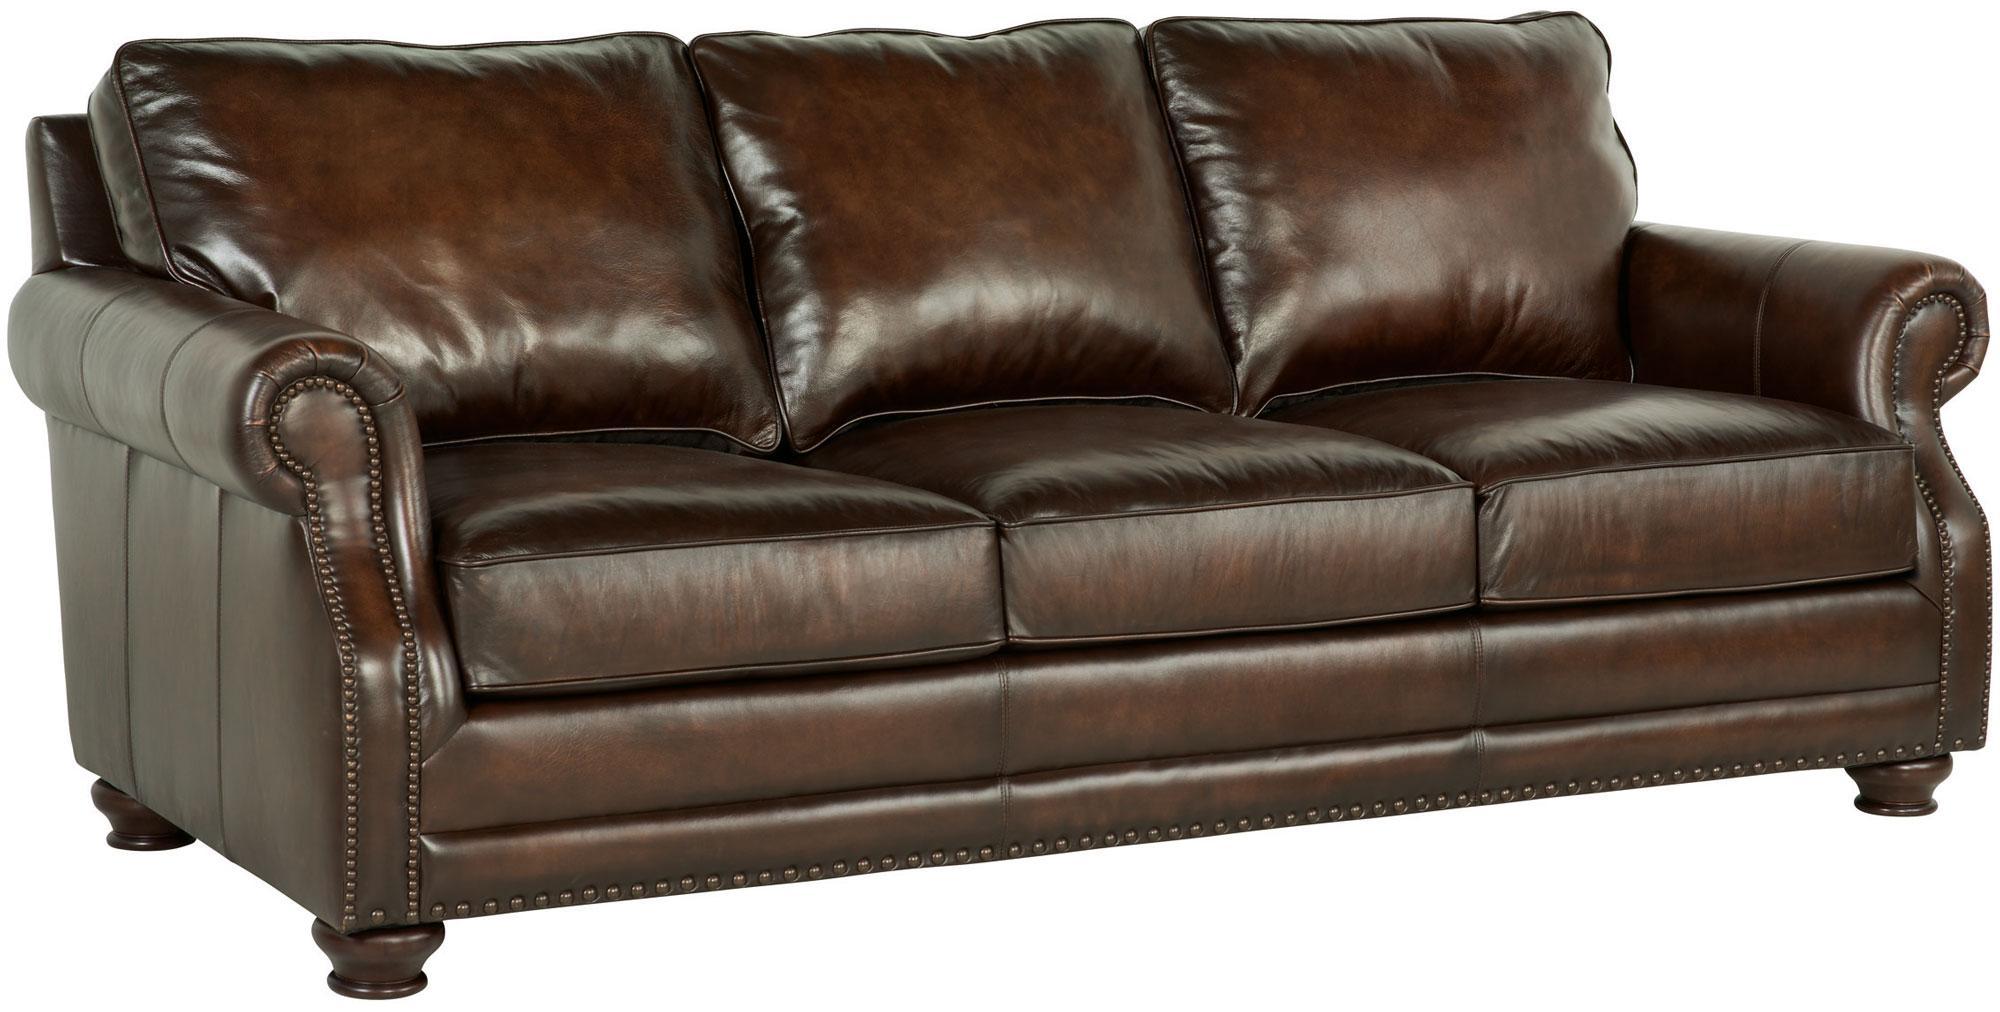 Furniture: Bernhardt Sofa | Sofa Bernhardt | Bernhardt Foster Sofa Regarding Foster Leather Sofas (View 9 of 20)